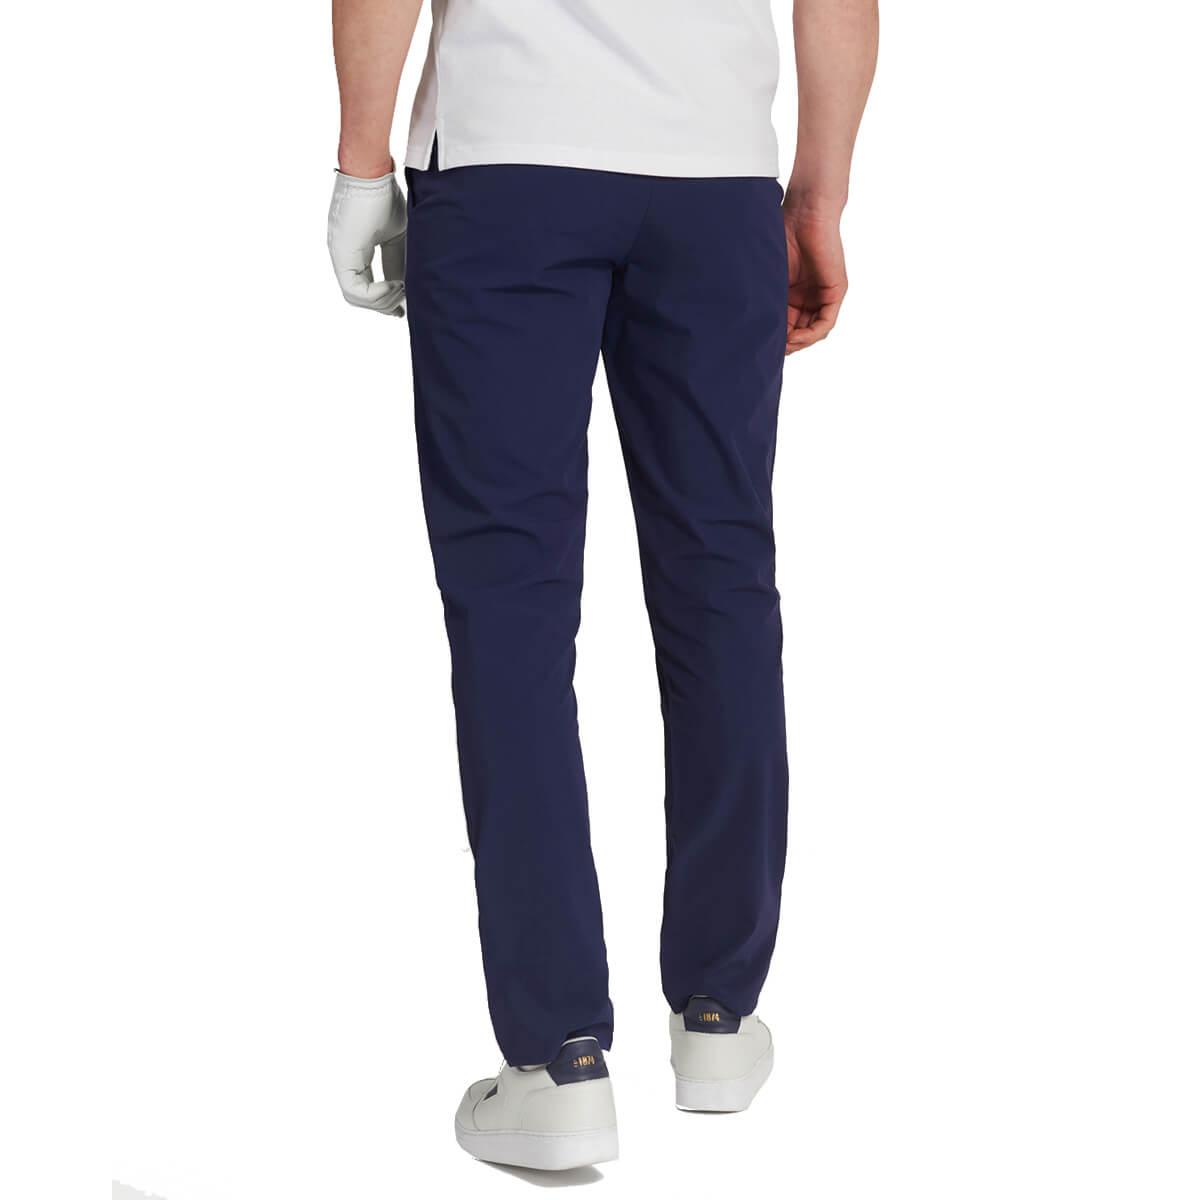 thumbnail 5 - Lyle & Scott Mens Golf Tech Light Stretch Breathable Trousers 55% OFF RRP